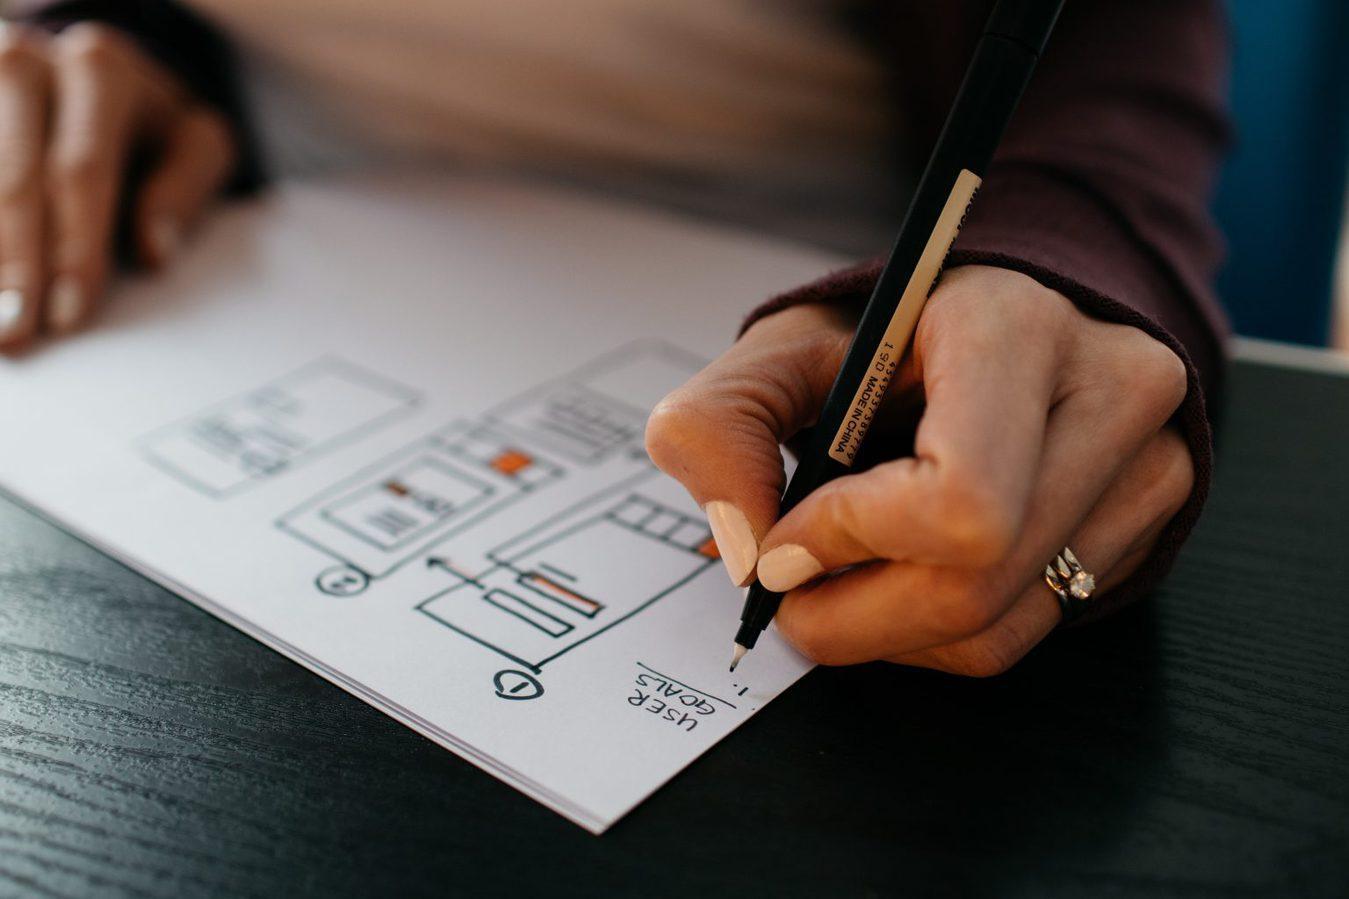 Person writing marketing strategy